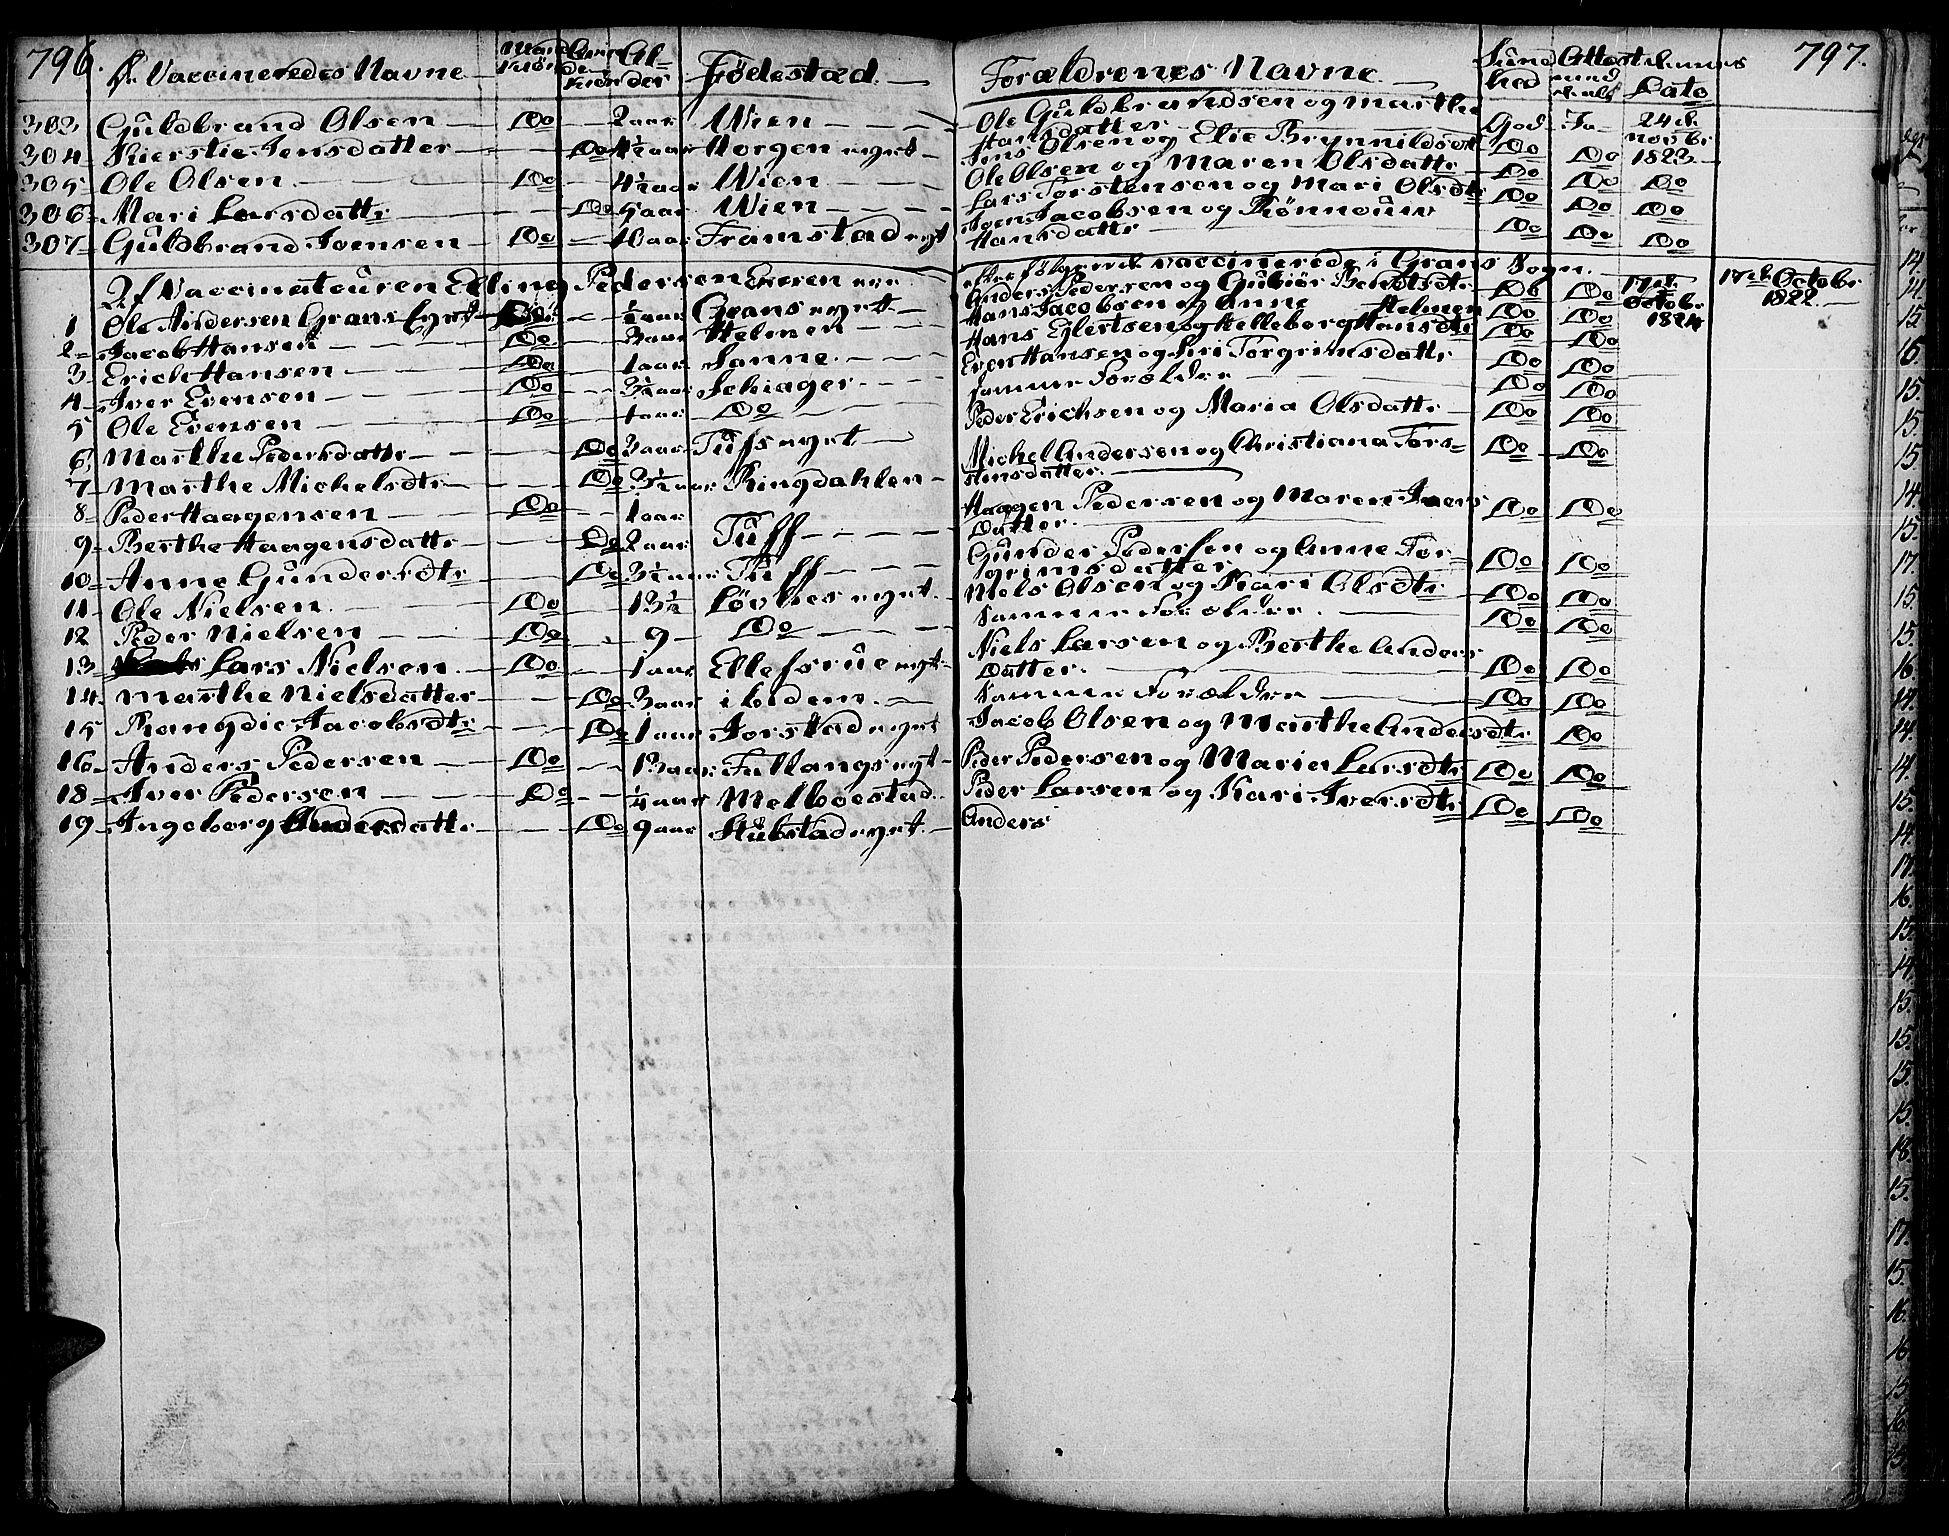 SAH, Gran prestekontor, Ministerialbok nr. 6, 1787-1824, s. 796-797